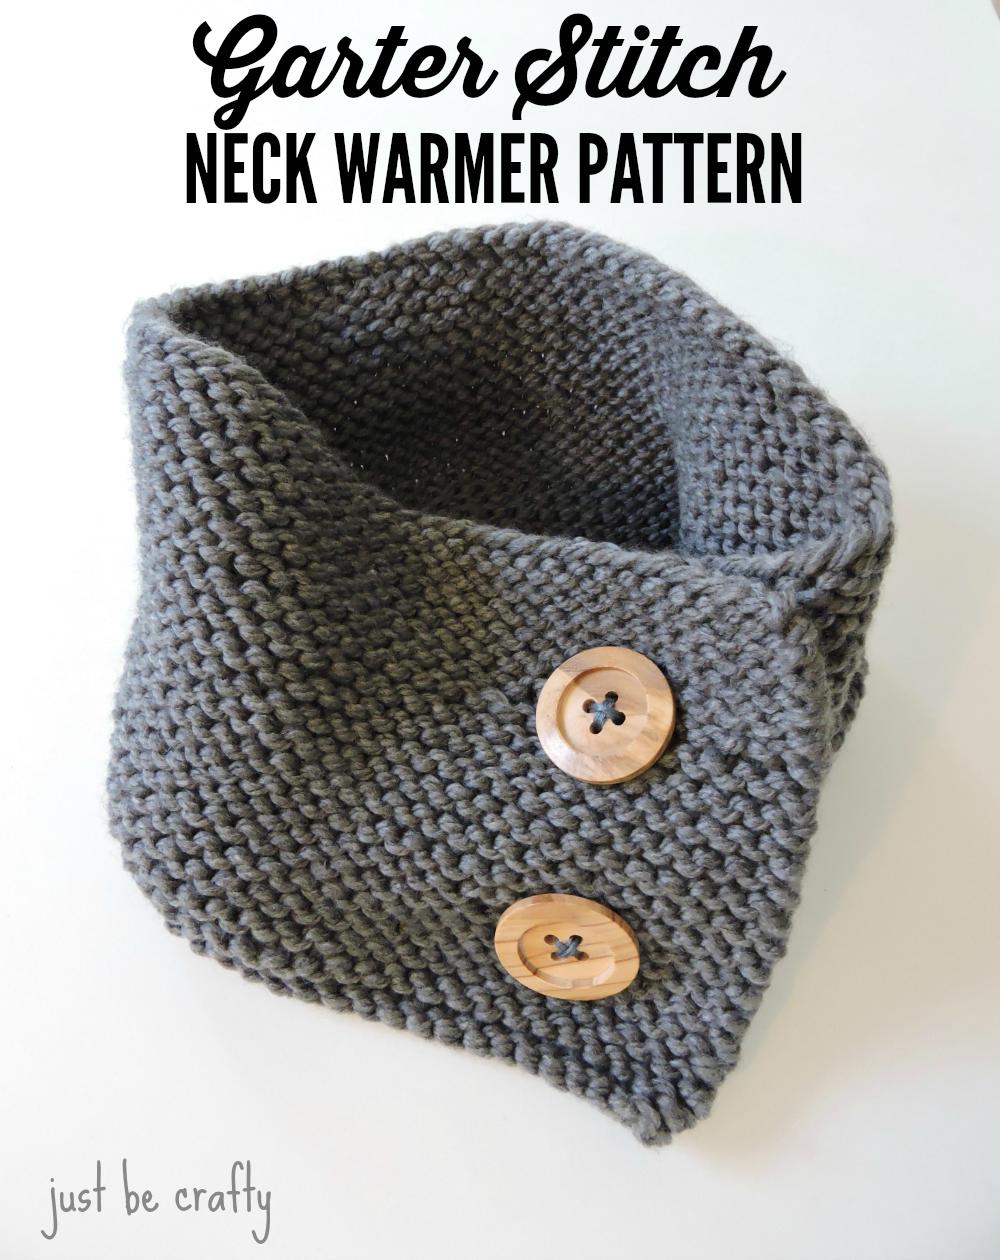 Garter stitch button up neck warmer neck warmer stitch and knit garter stitch button up neck warmer knit cowl patternscrochet bankloansurffo Choice Image